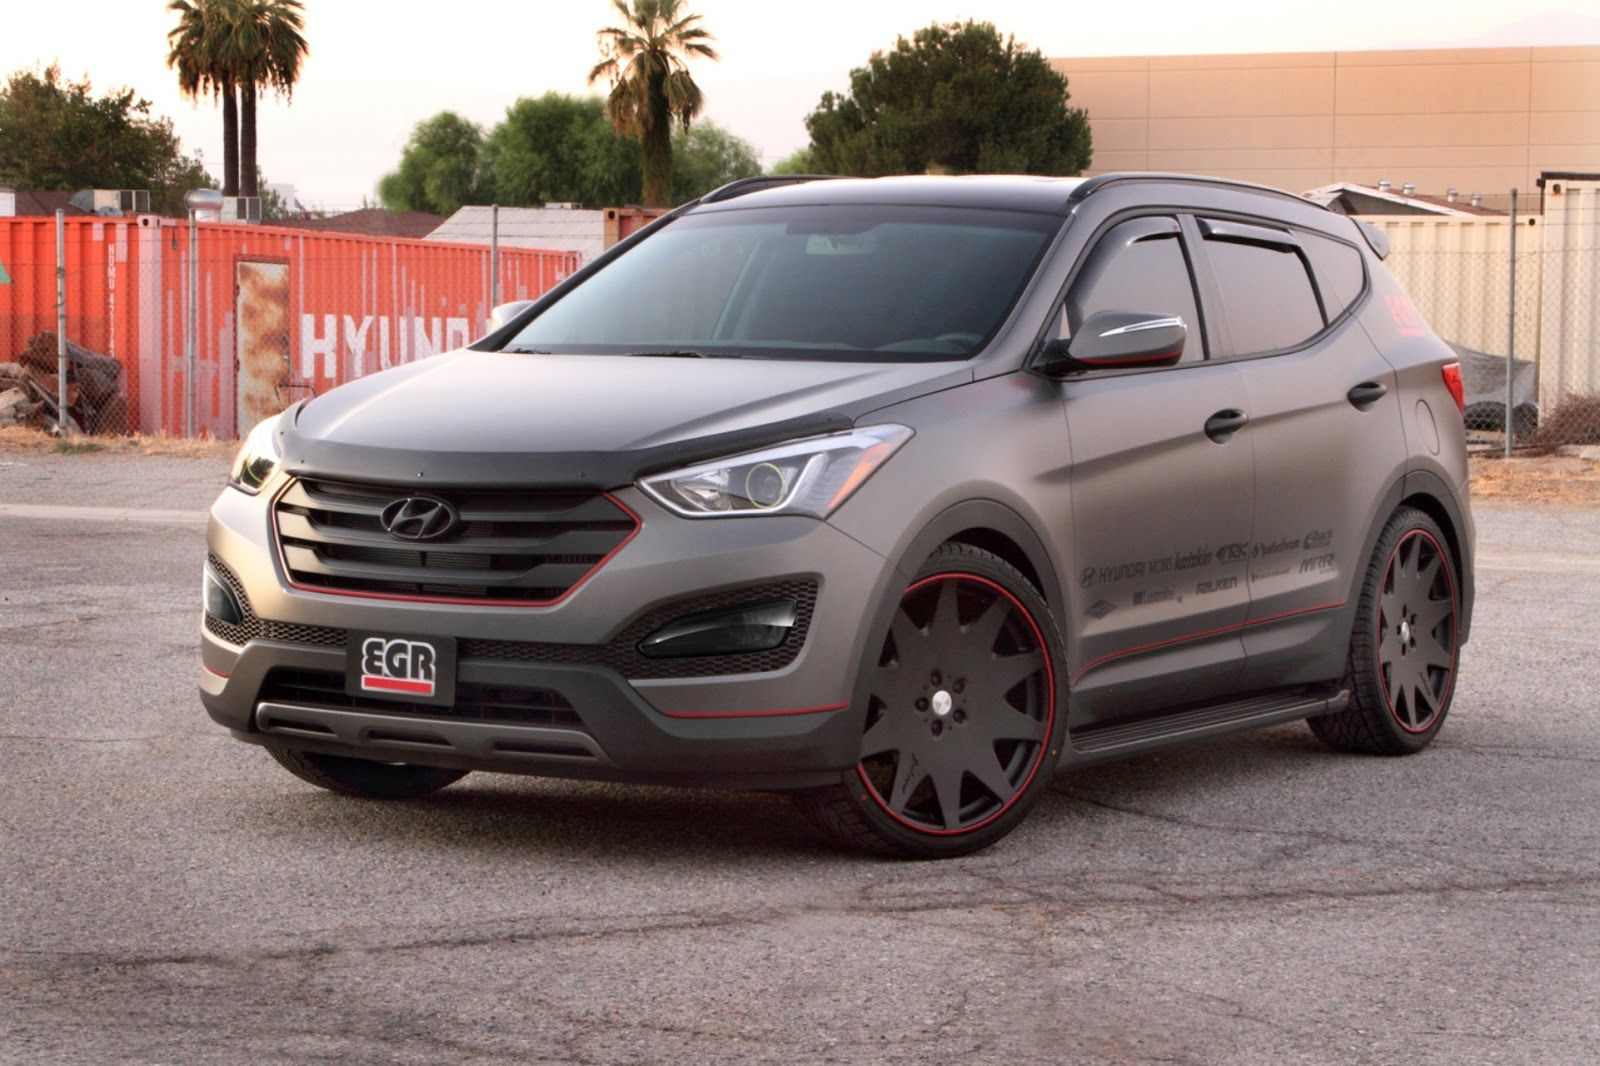 2012+Hyundai+Santa+Fe+Sport+by+EGR.jpg 1,600×1,066 pixels